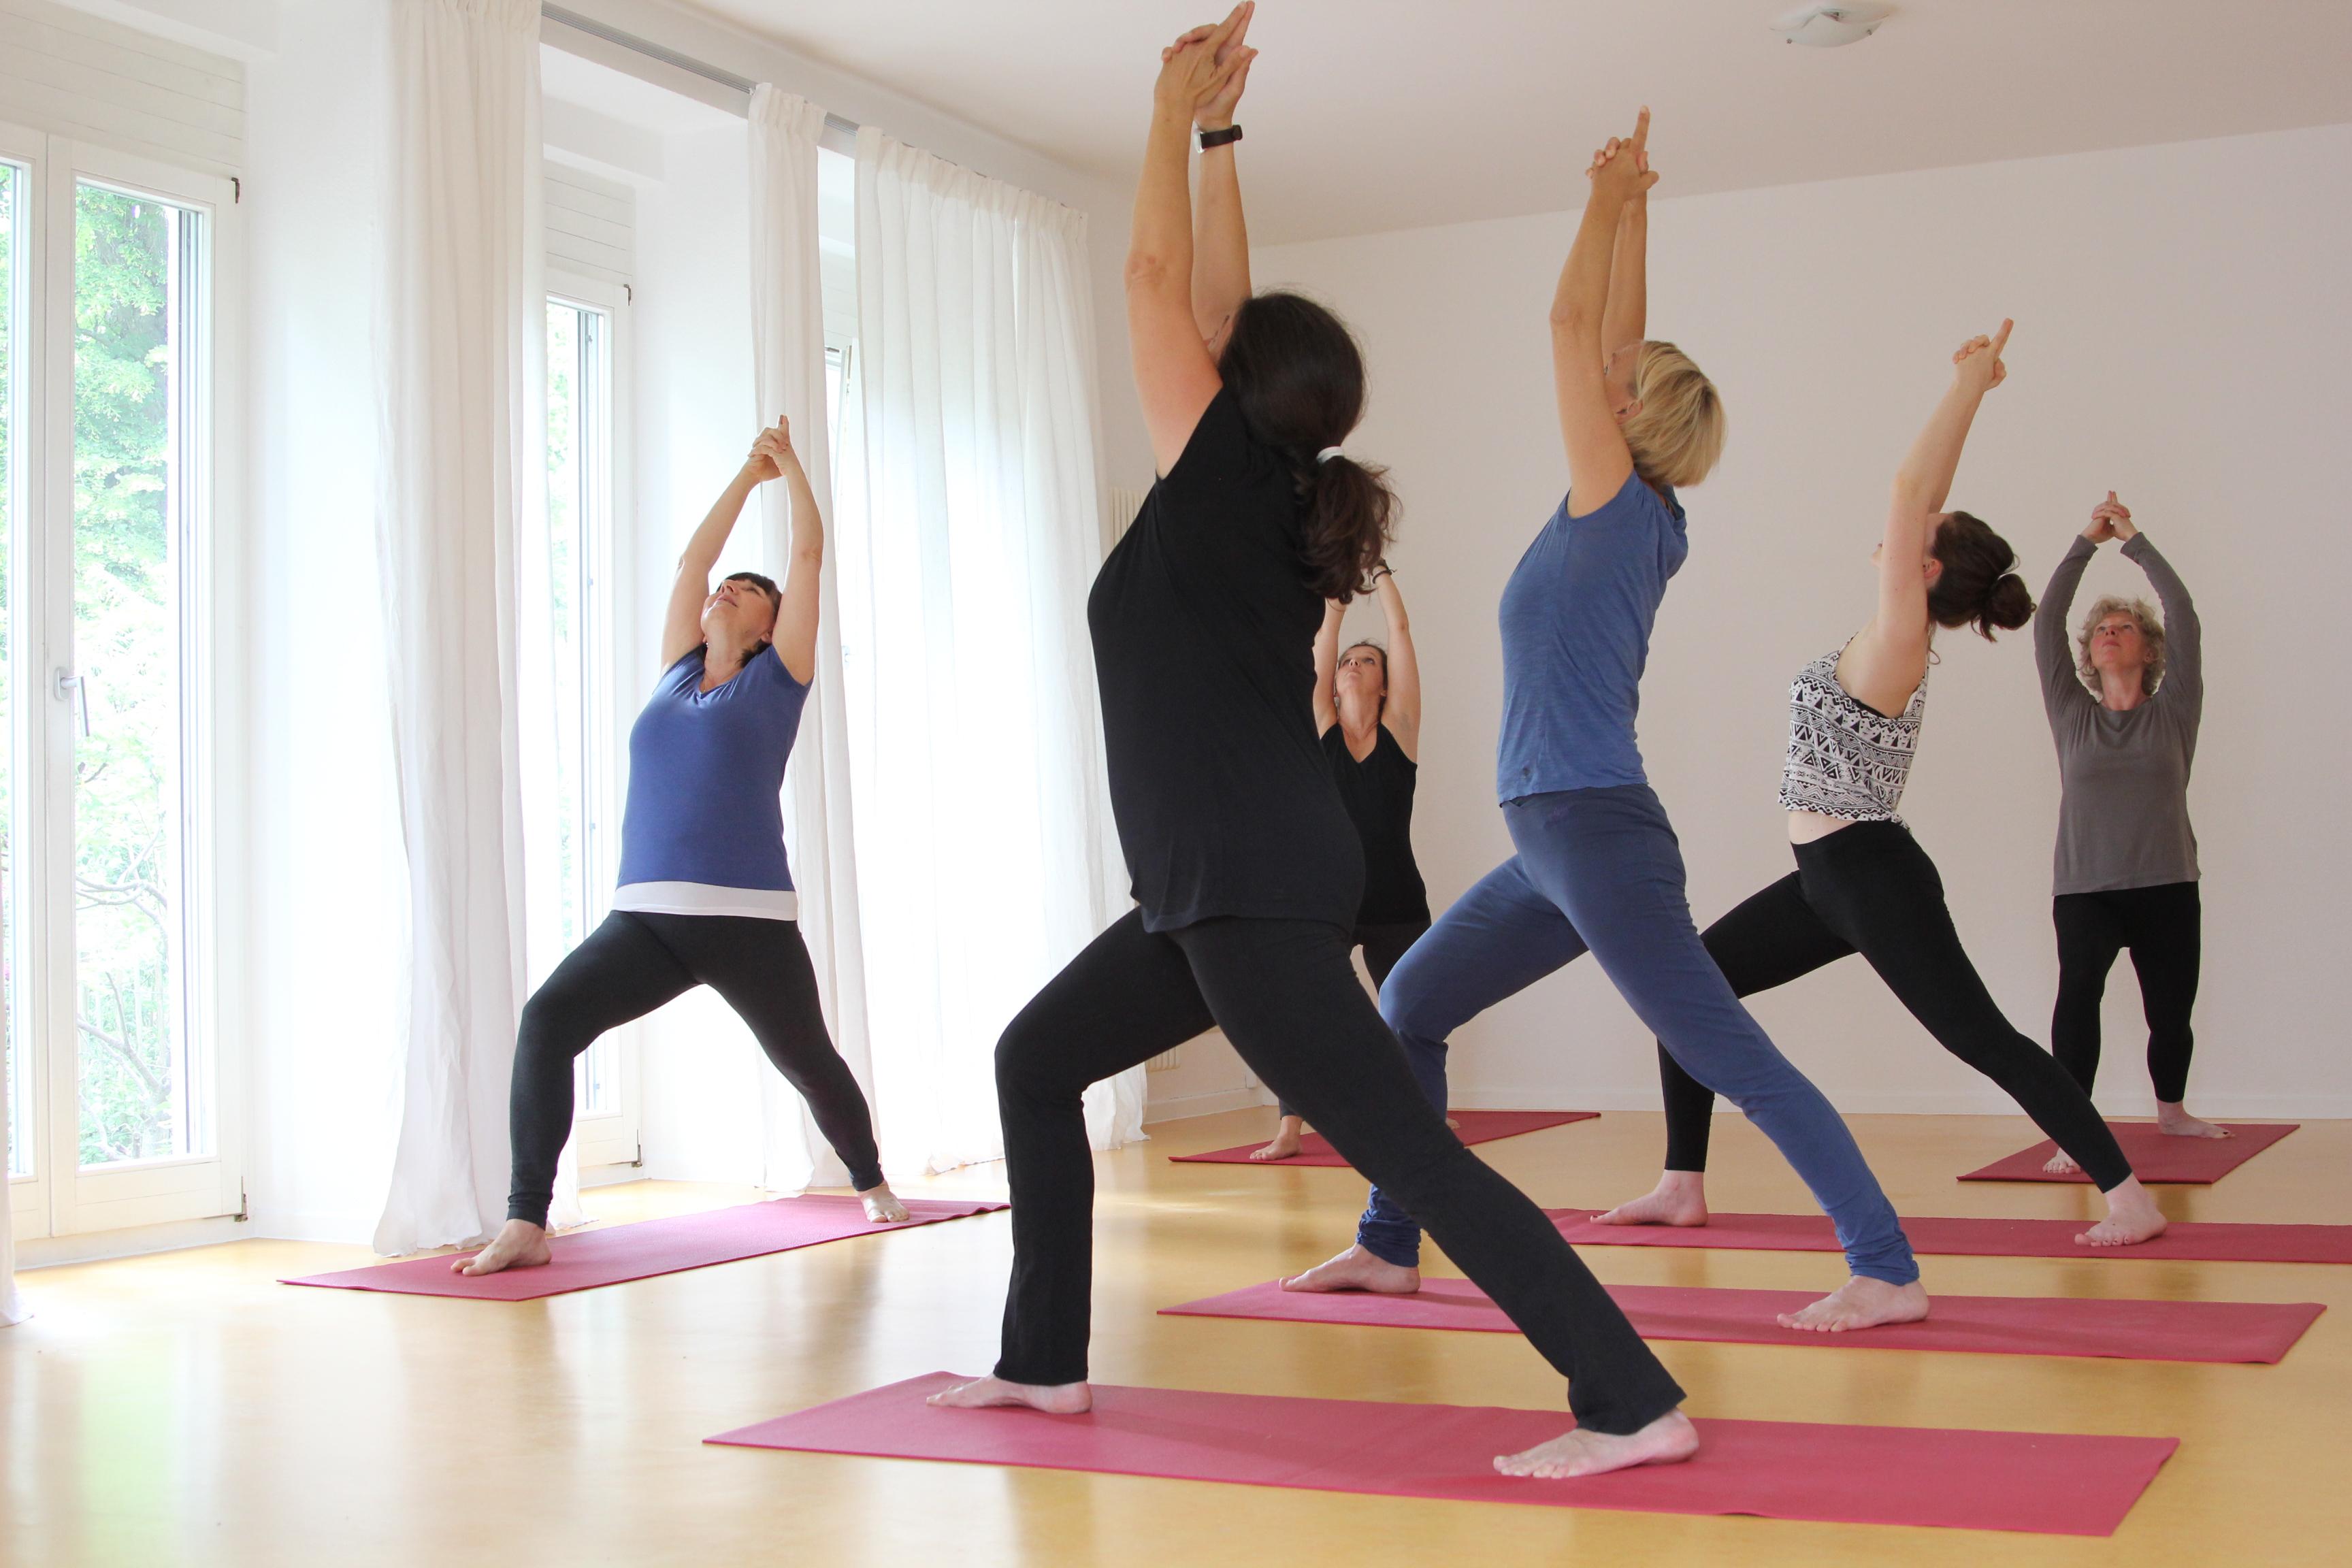 herzlich yoga bewegt lenka nikolaus. Black Bedroom Furniture Sets. Home Design Ideas